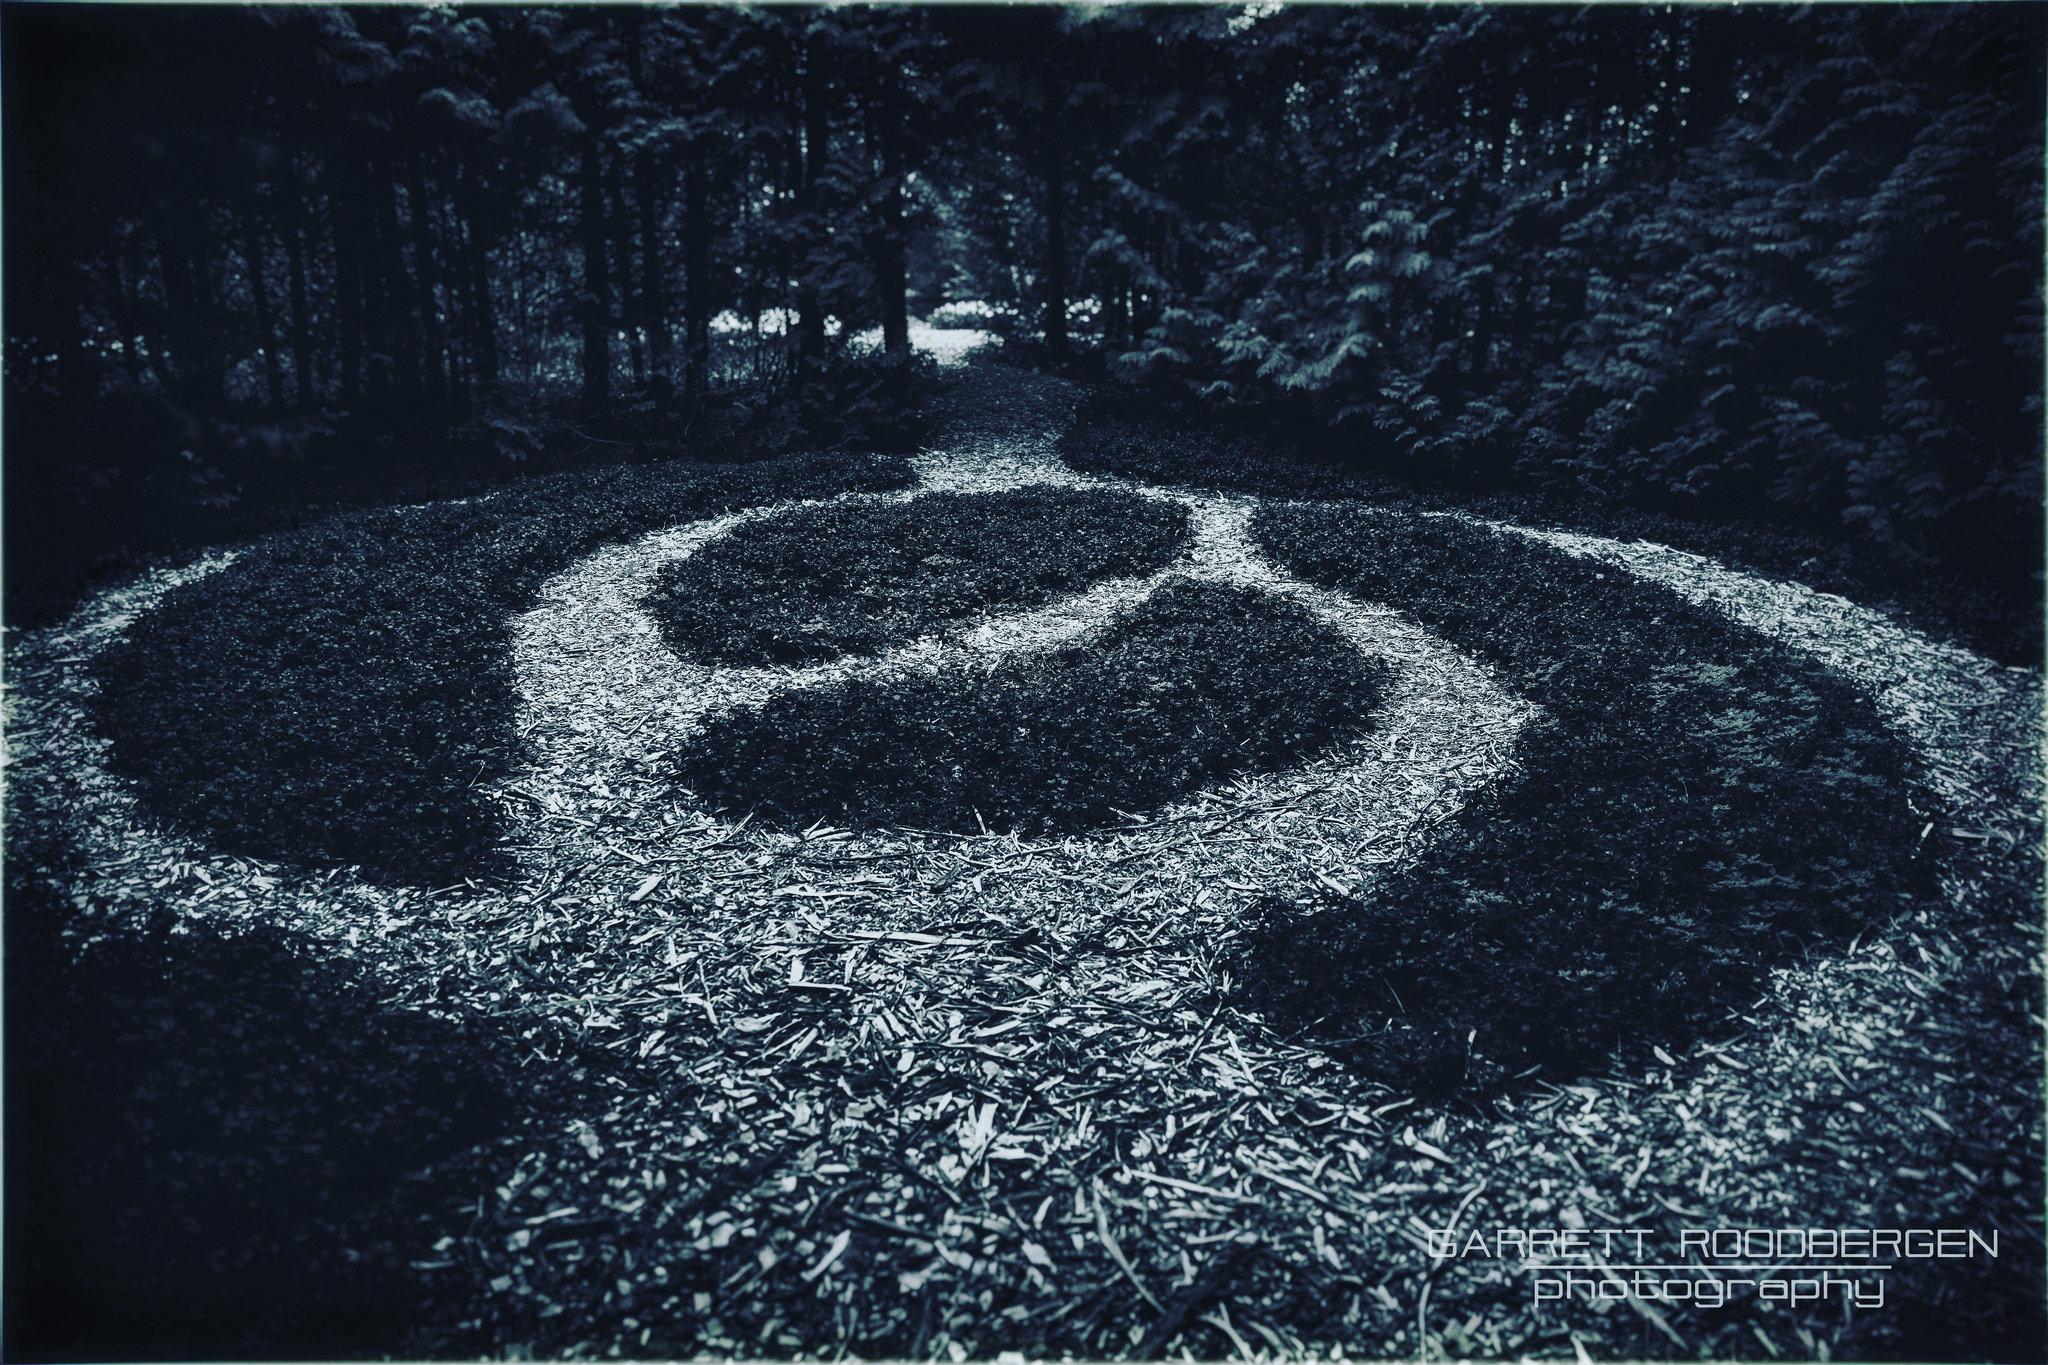 The Grove in the Garden #grandhotel #mackinacisland #mackinac #puremichigan #michigan #photographyislife #photography #grove #clearing #woods #forest #garden #mystery #hidden #adobe #canon #5dmarkiii #vacation #adventure